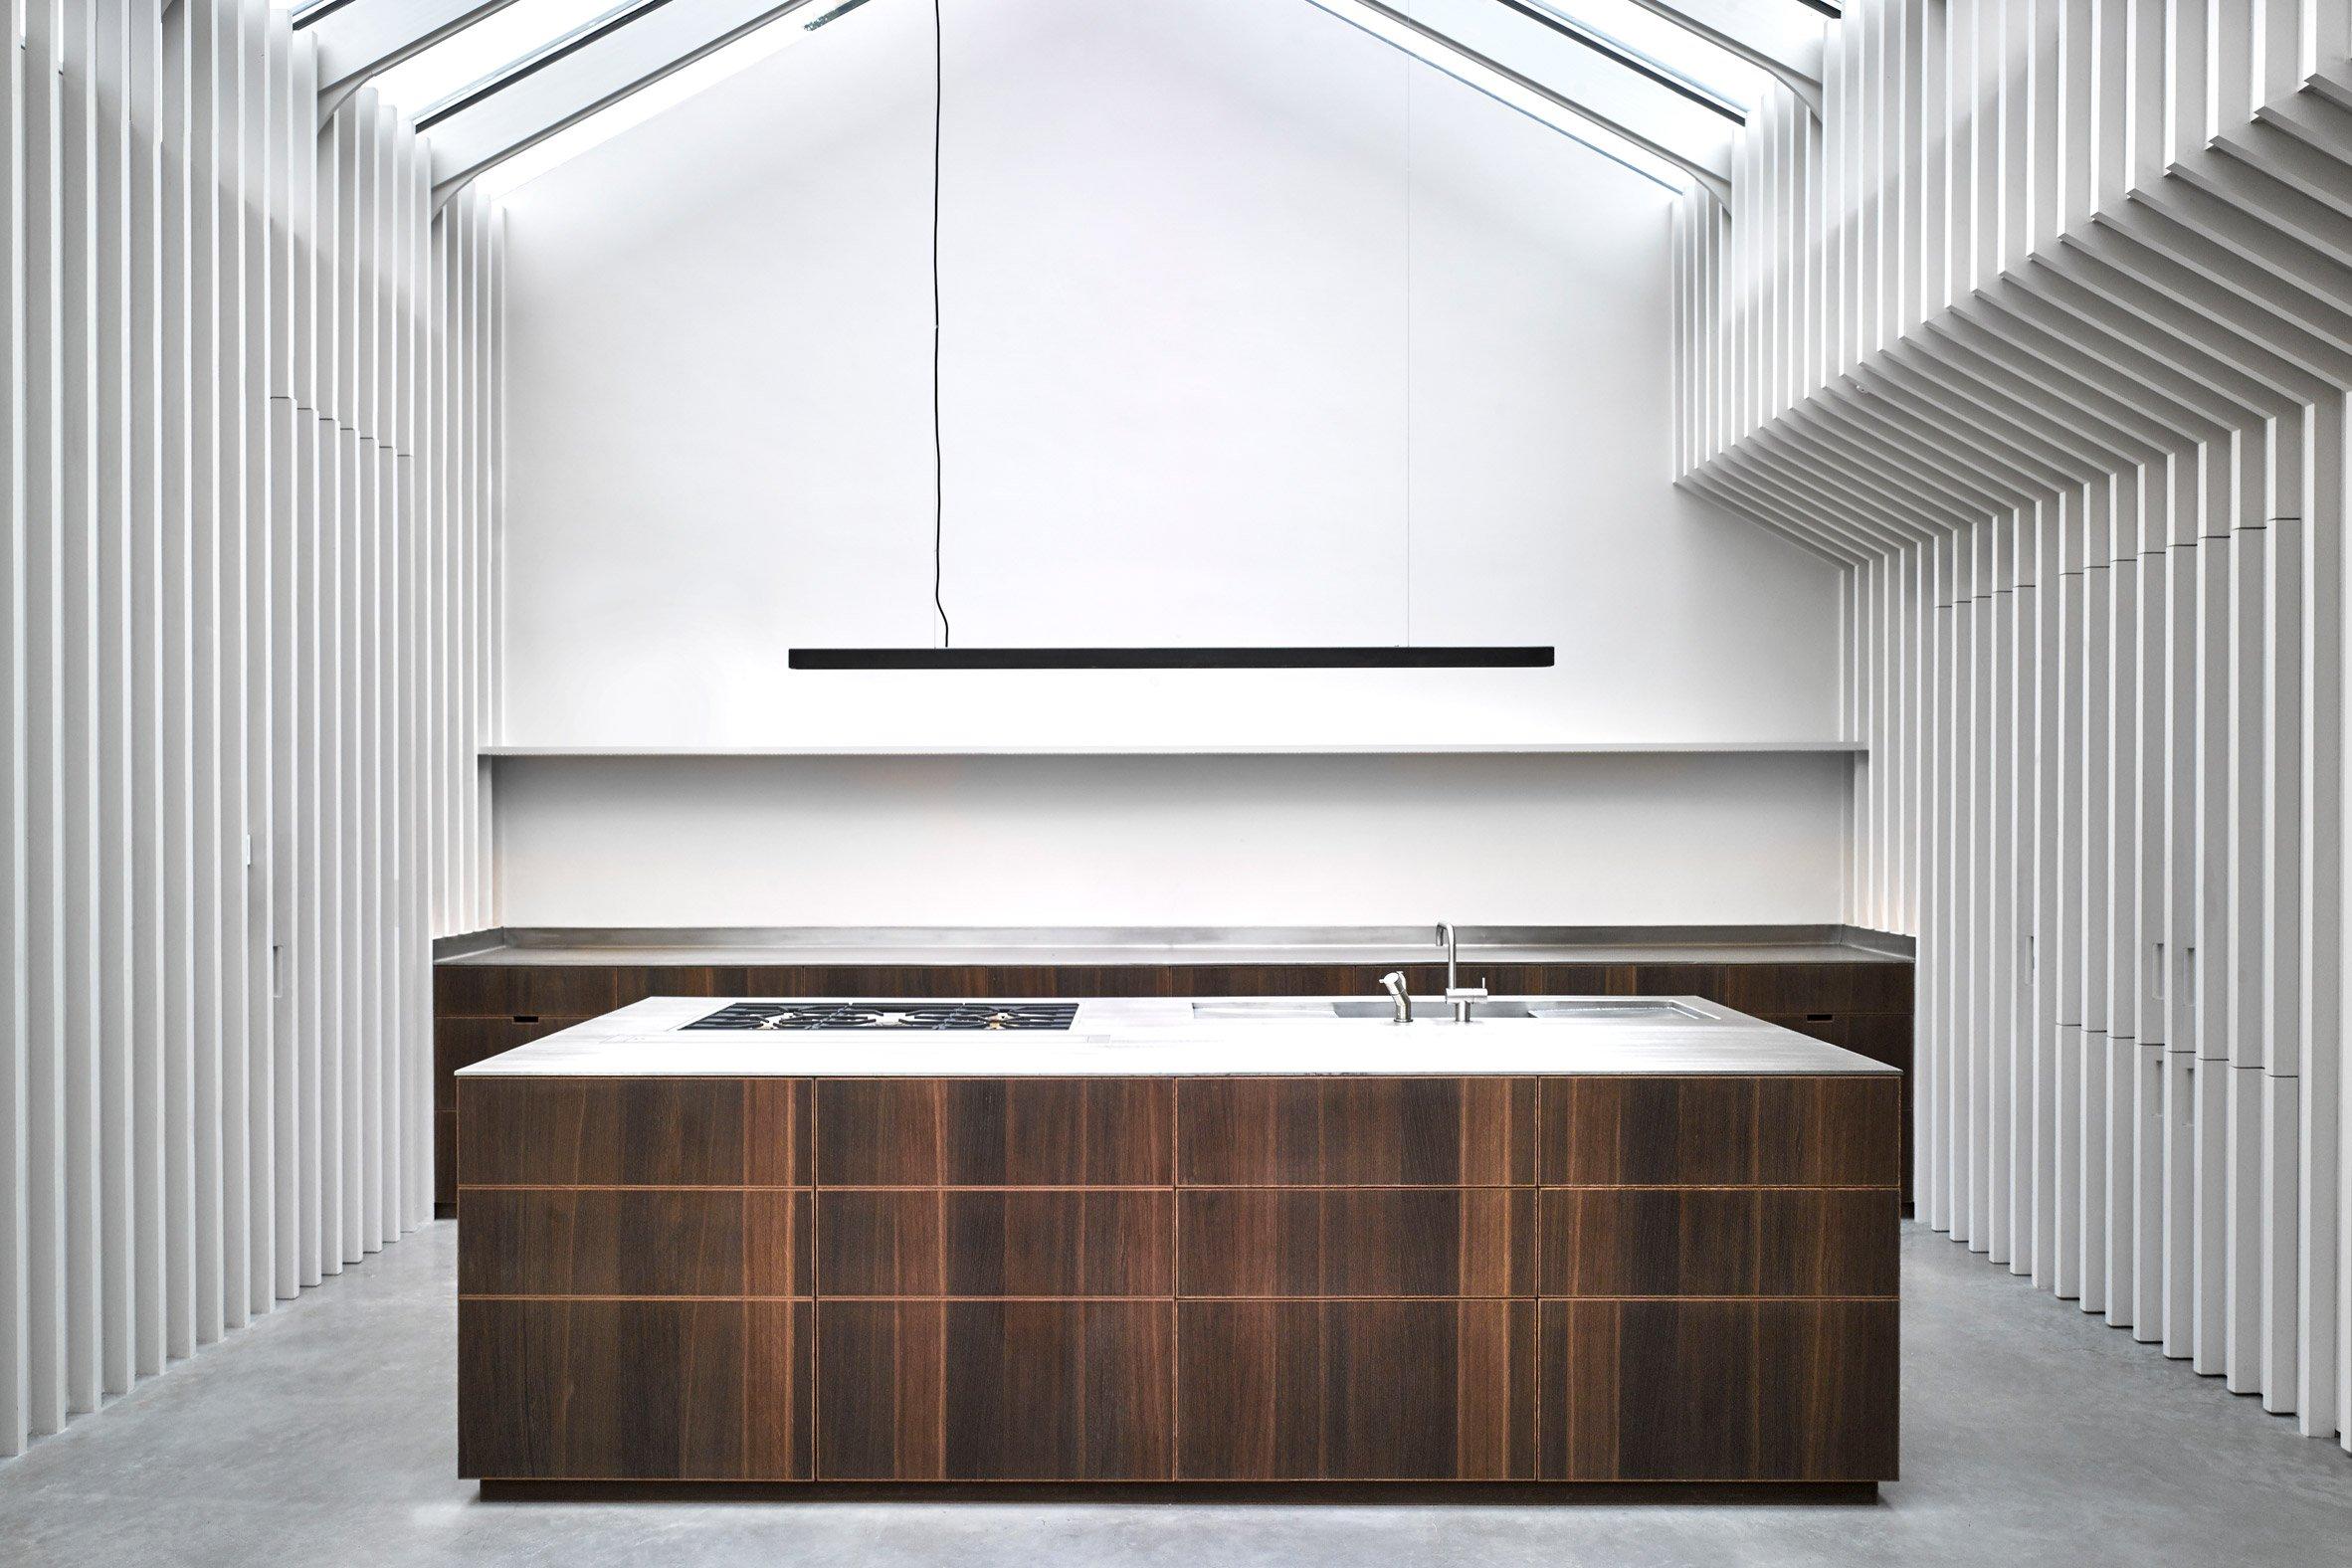 architecture-residential-london-interior-design-studia-osnovadesign-osnova-poltava_02